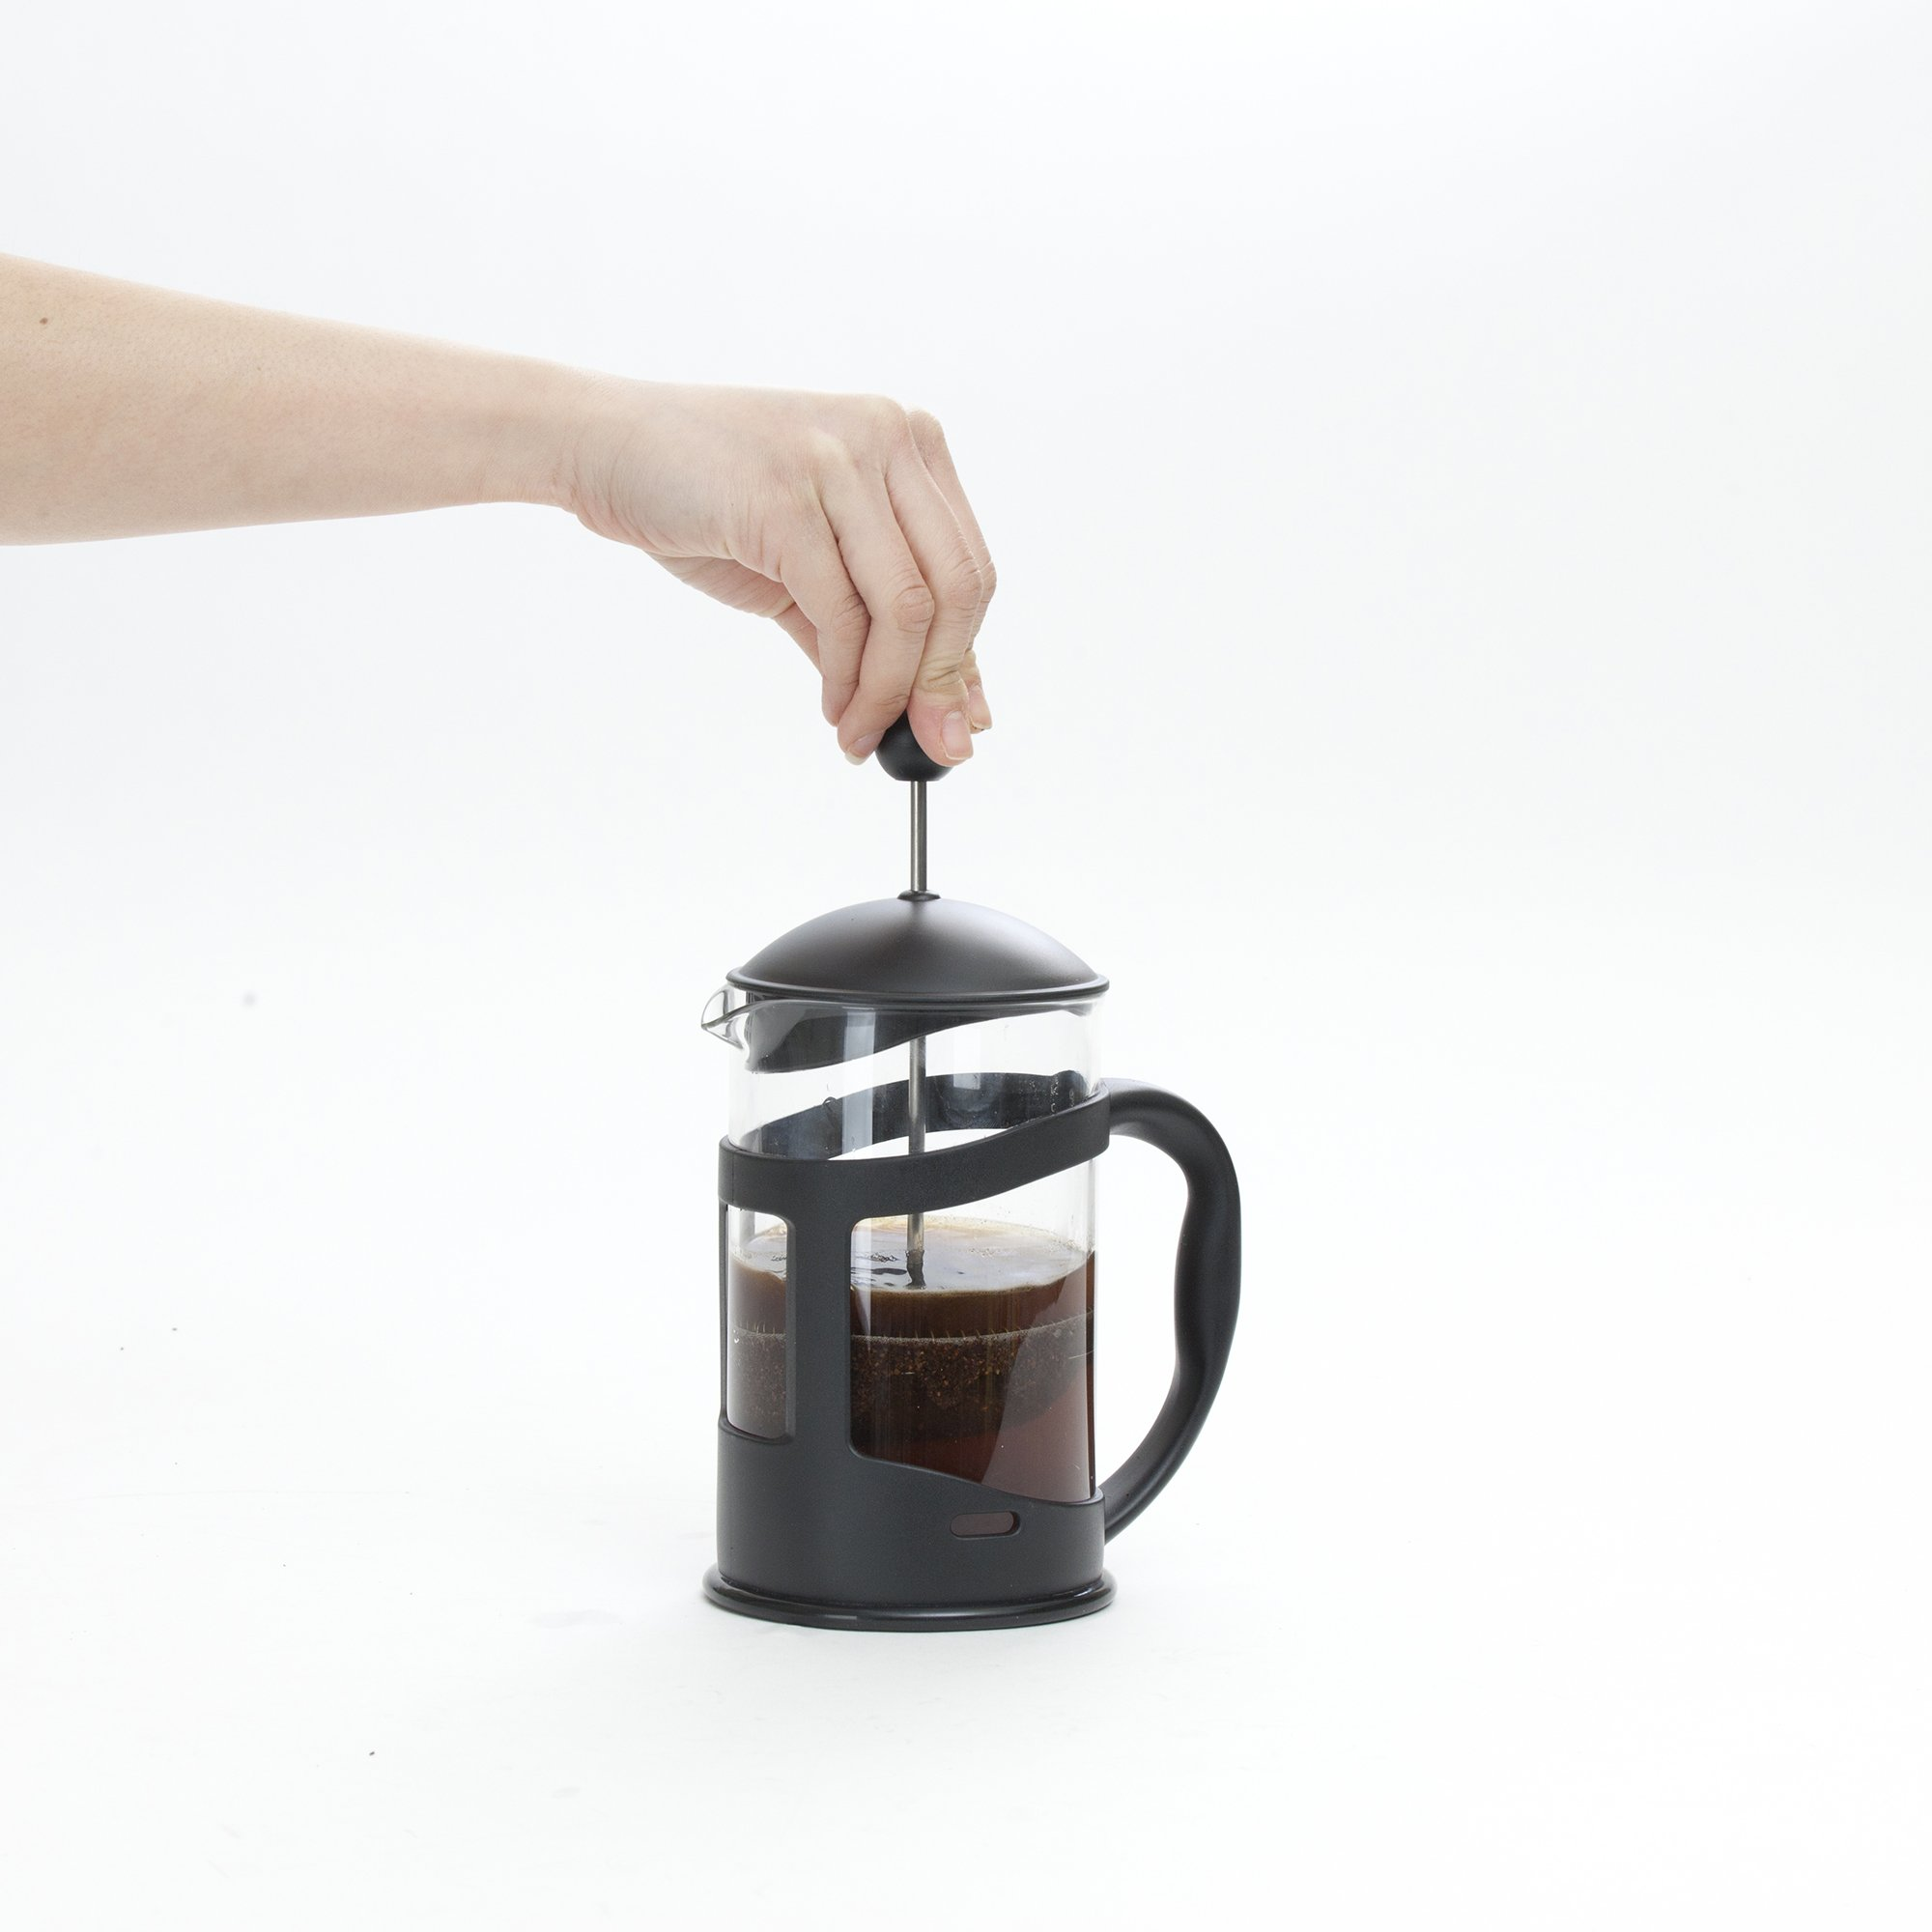 Mind Reader French Press Coffee & Tea Maker 27 oz, Glass by Mind Reader (Image #4)